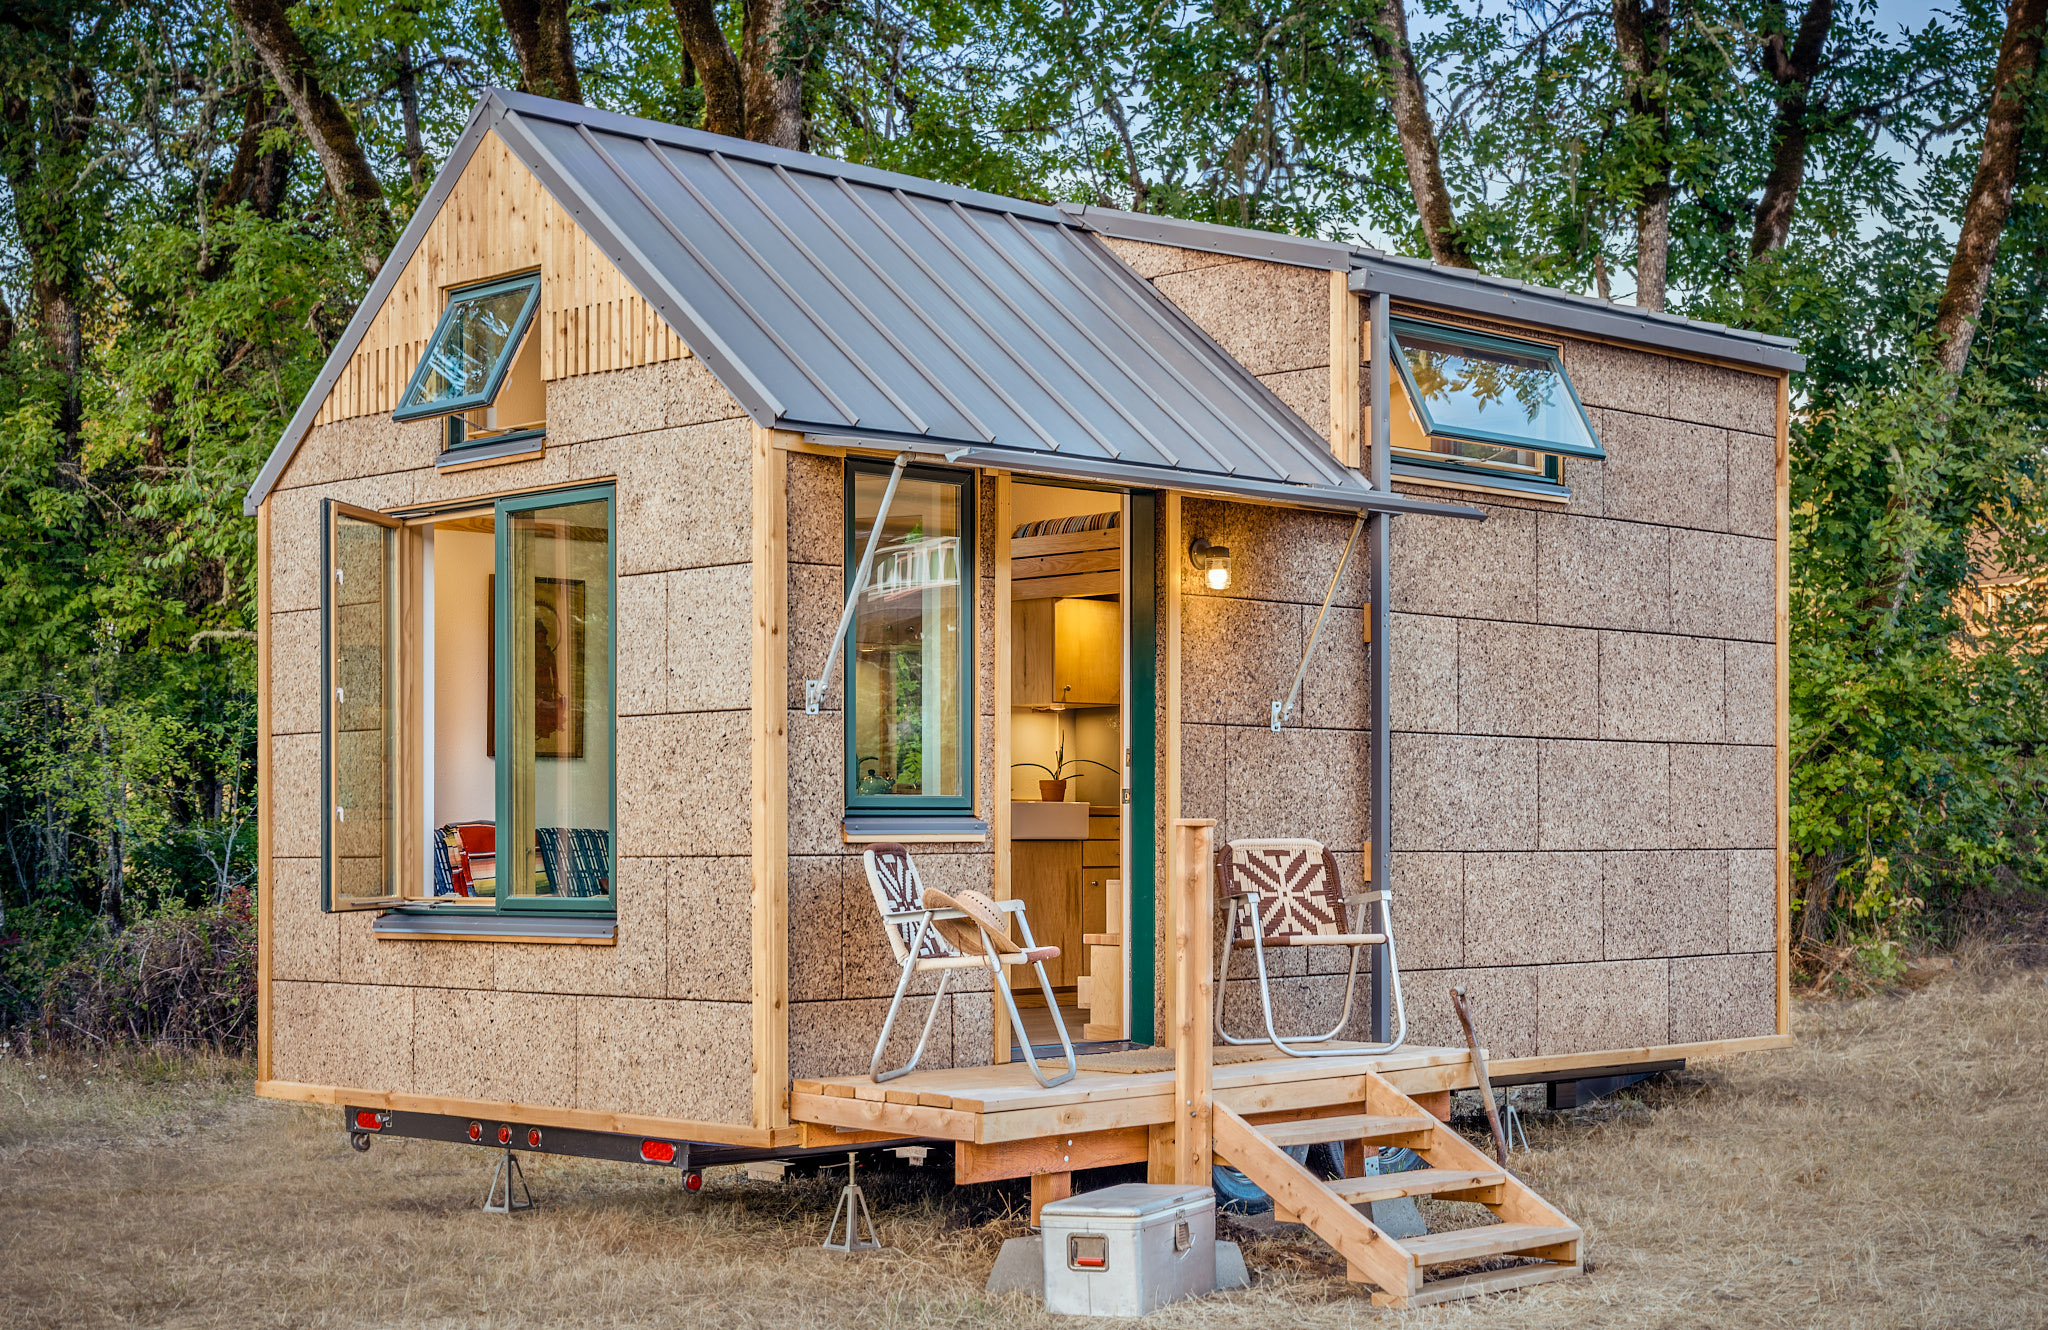 Tiny-House-Culitivate-inc-©-Evan-Kaufman-0001 squarespace.jpg